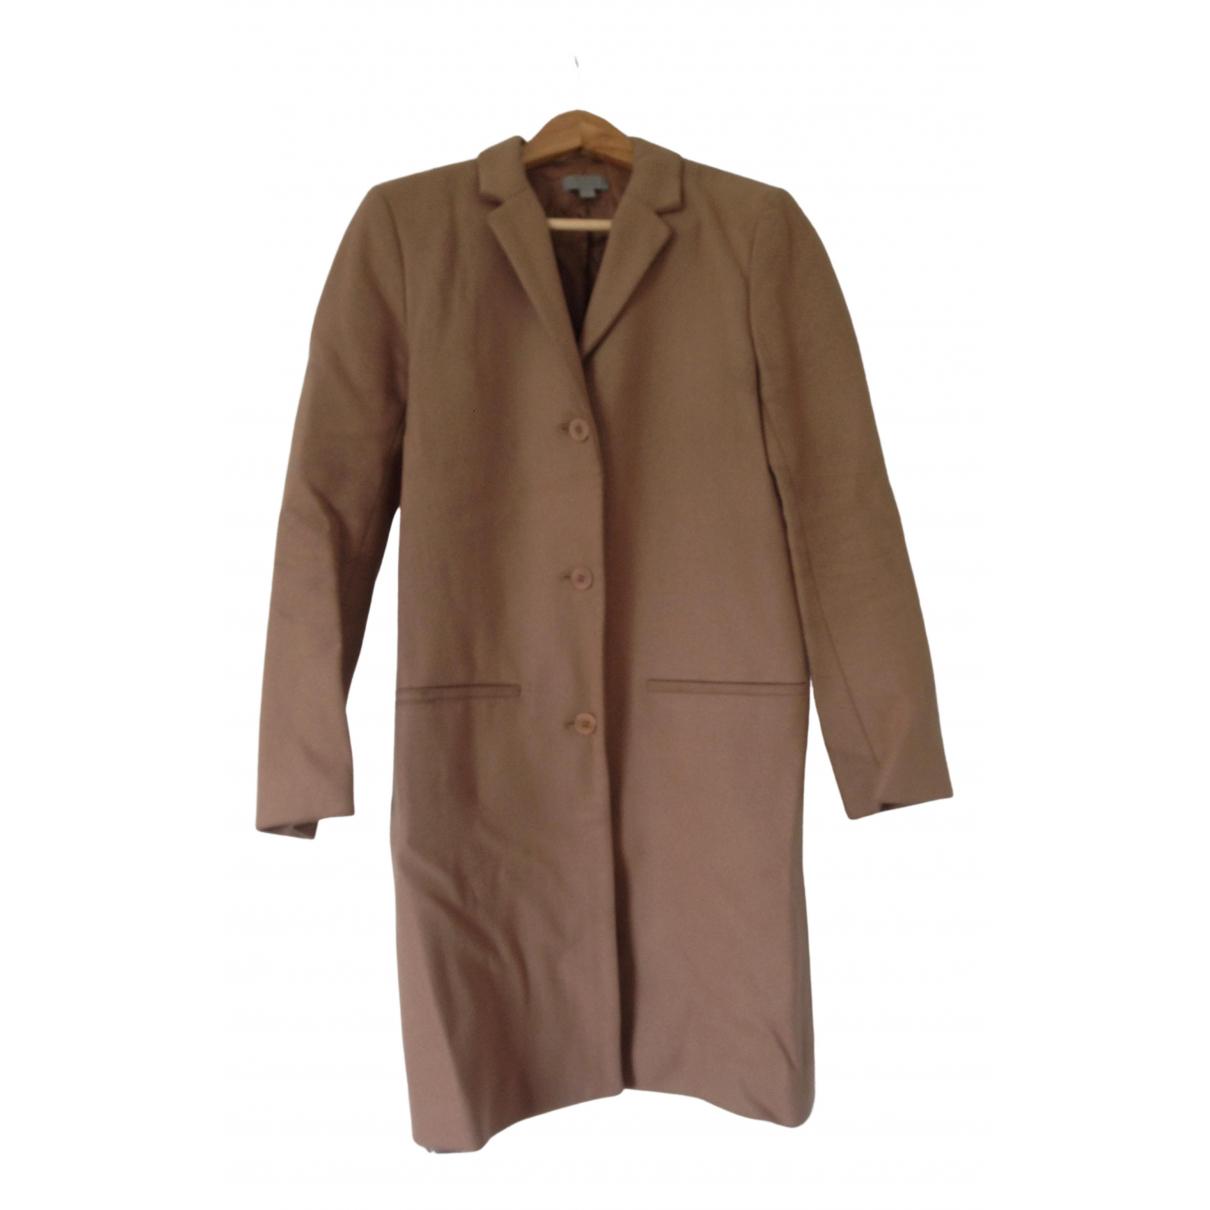 Cos \N Camel Wool coat for Women S International